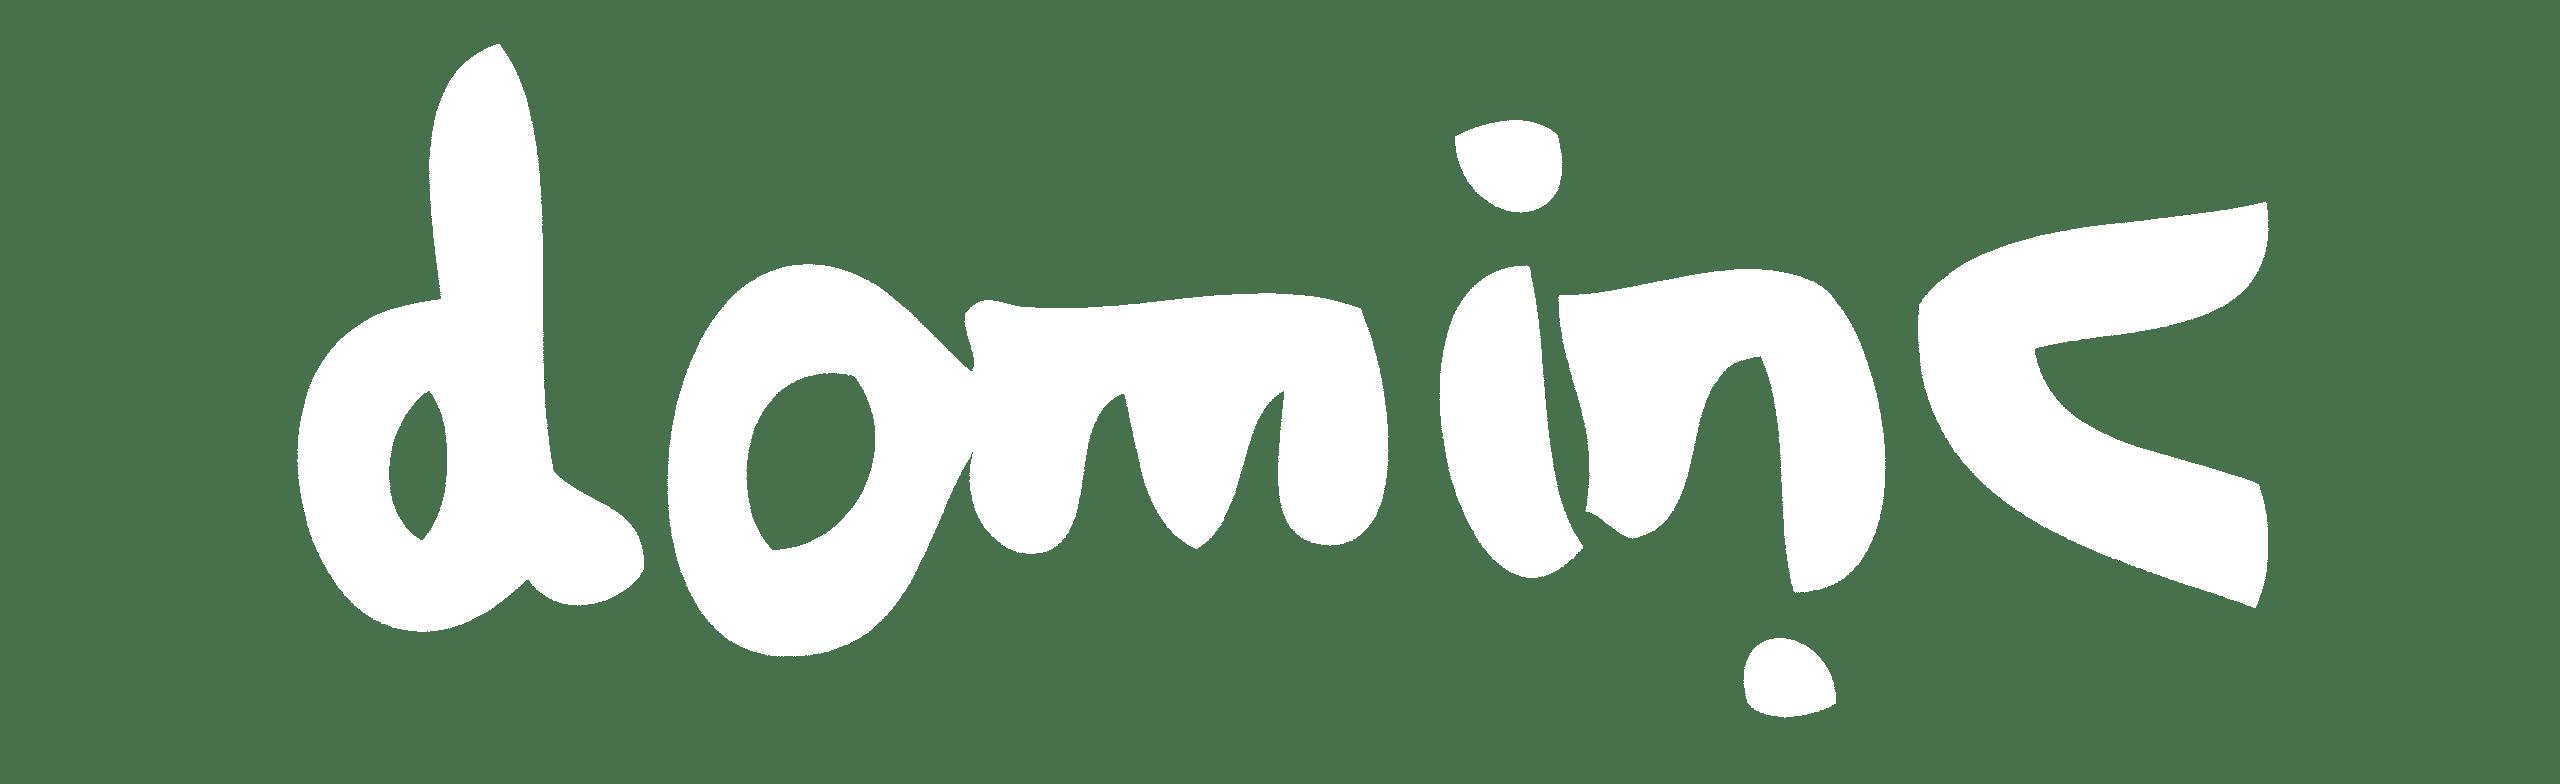 Dominic Brown | New Mixed Media Art